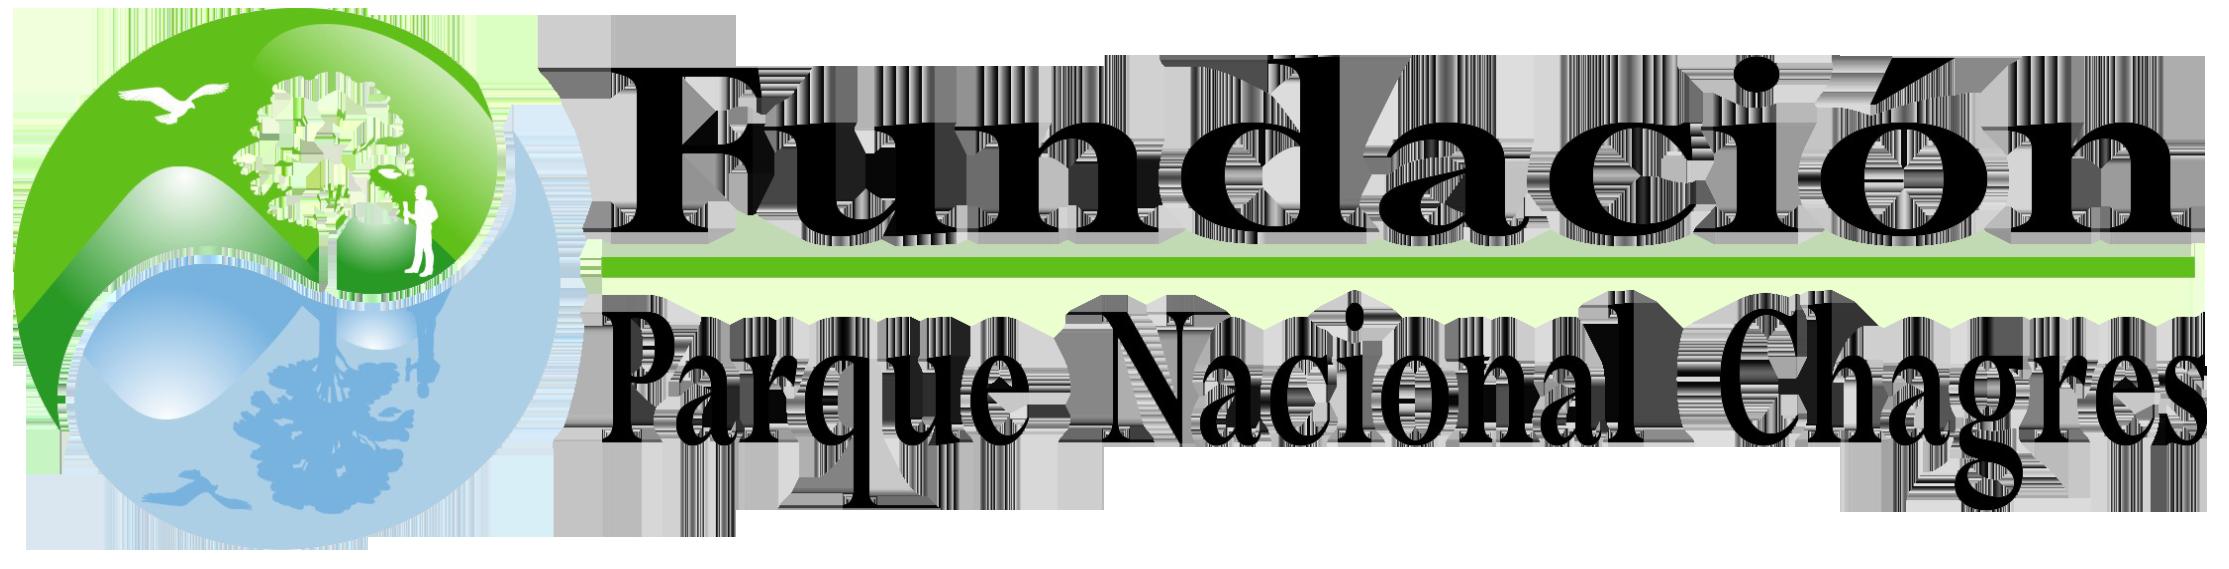 Logo parque nancional chagres